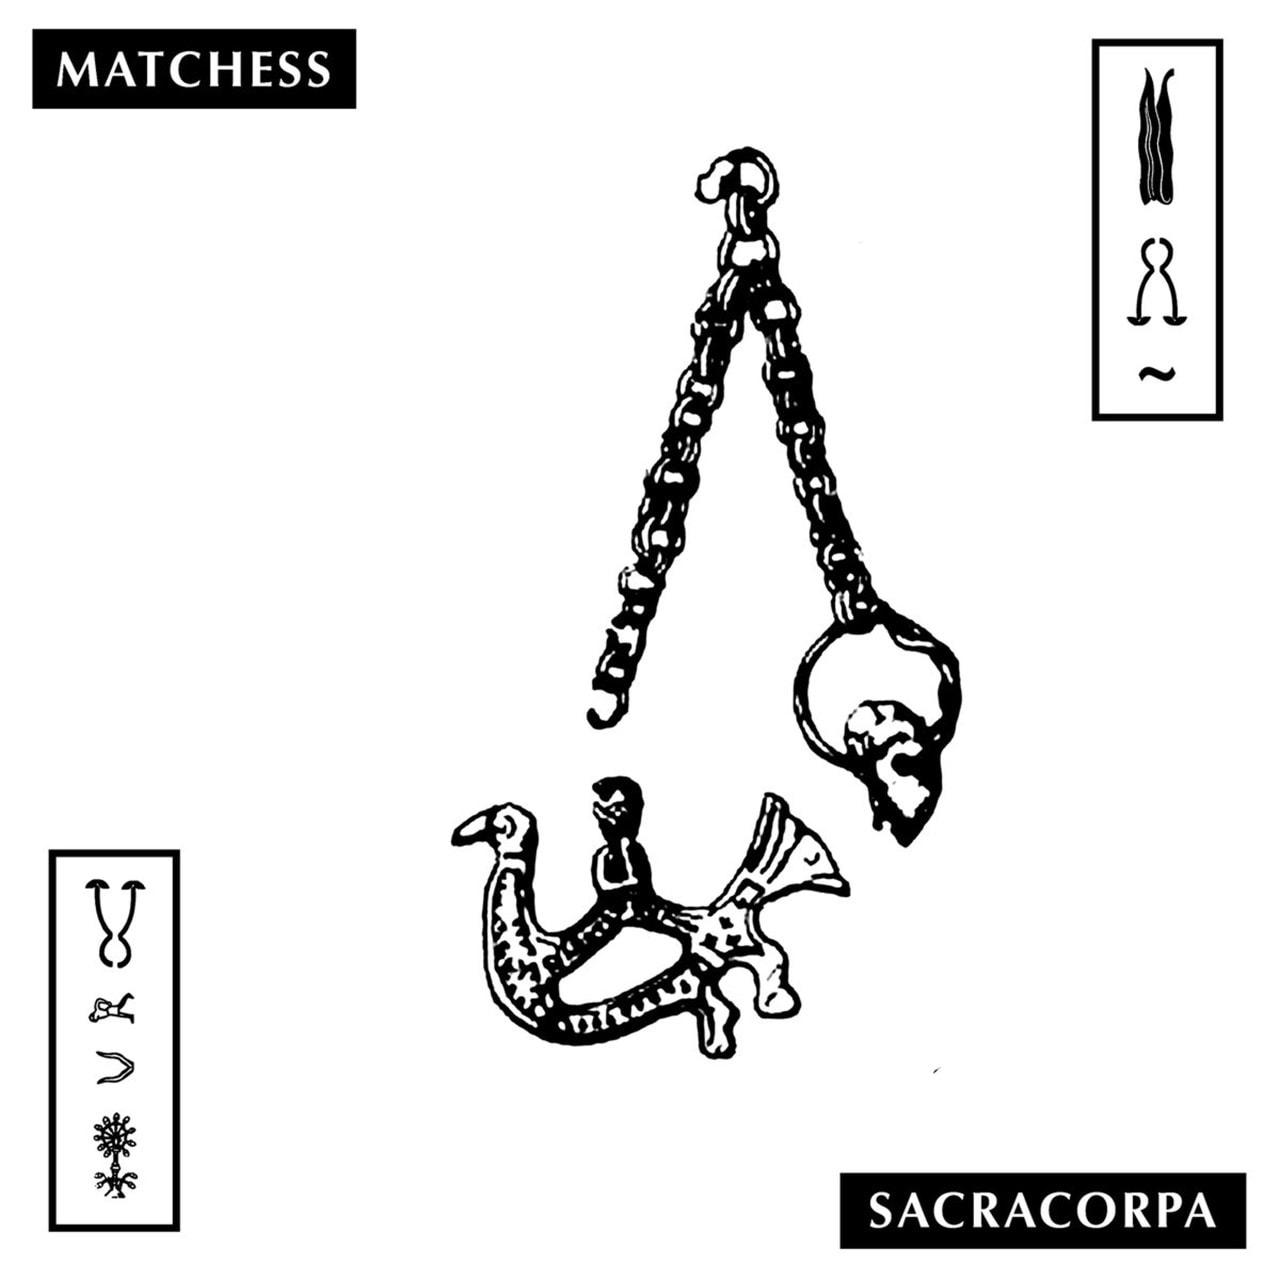 Sacracorpa - 1